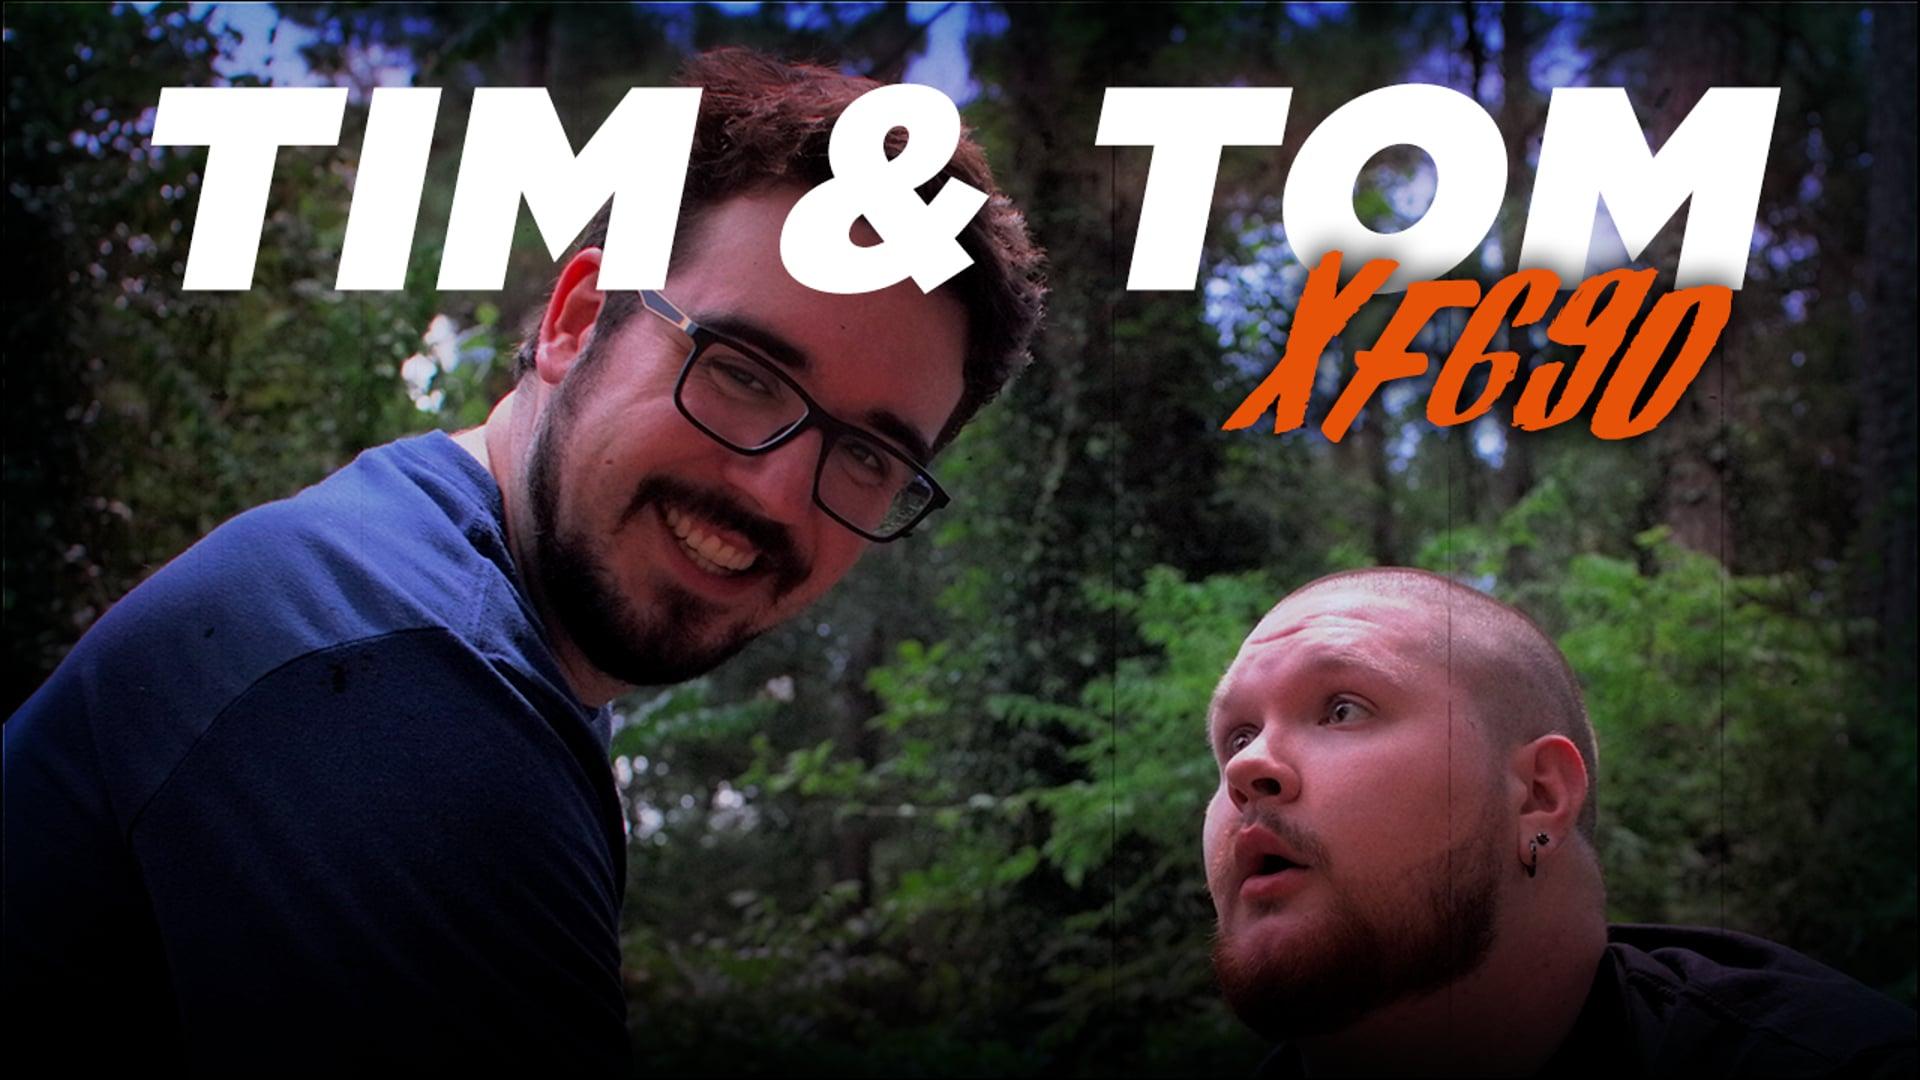 Tim & Tom Purple Edition